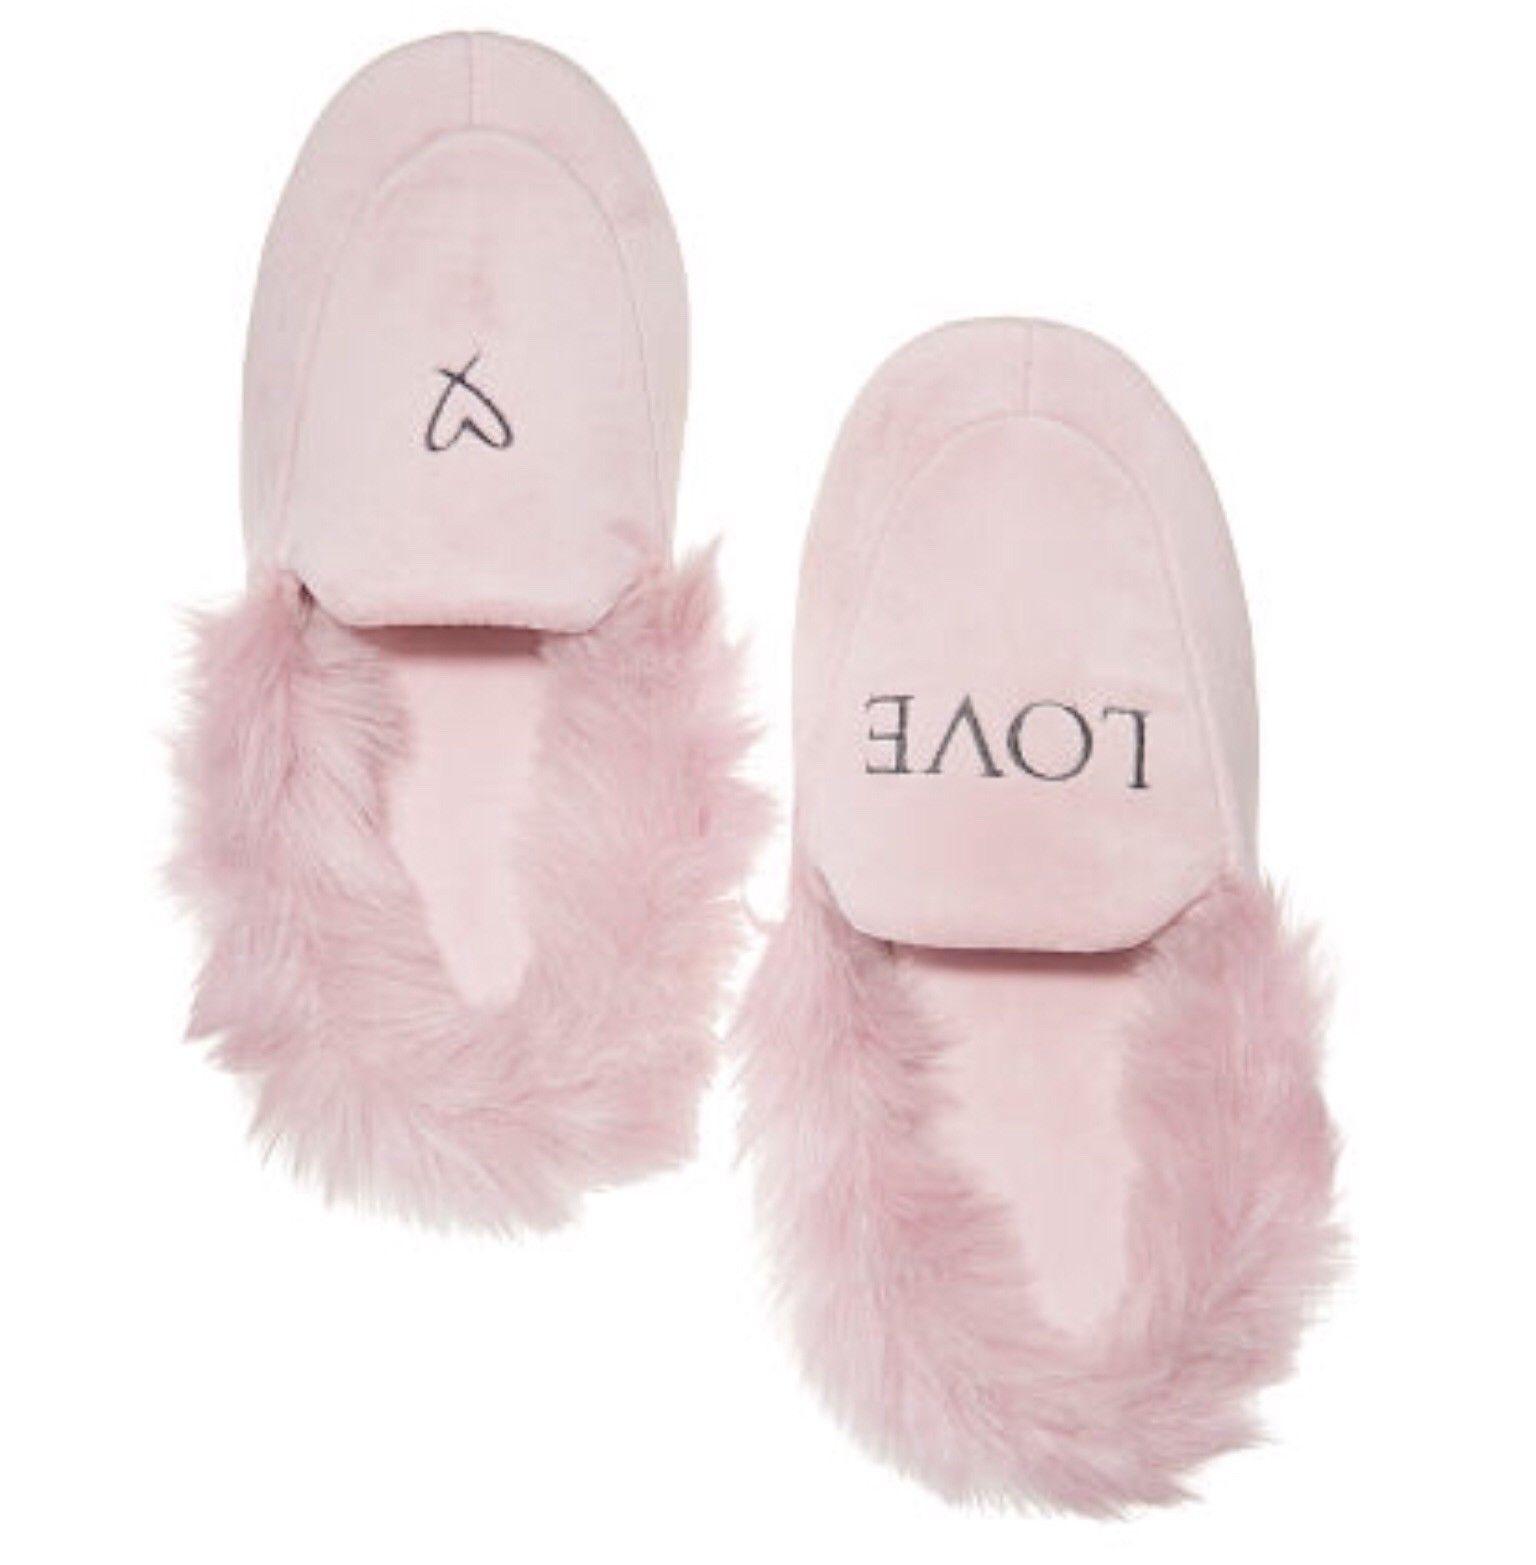 Victoria Secret VELVET SLIPPER furry Pink Blue Black M L XL 7 8 9 10 11 Gift NEW